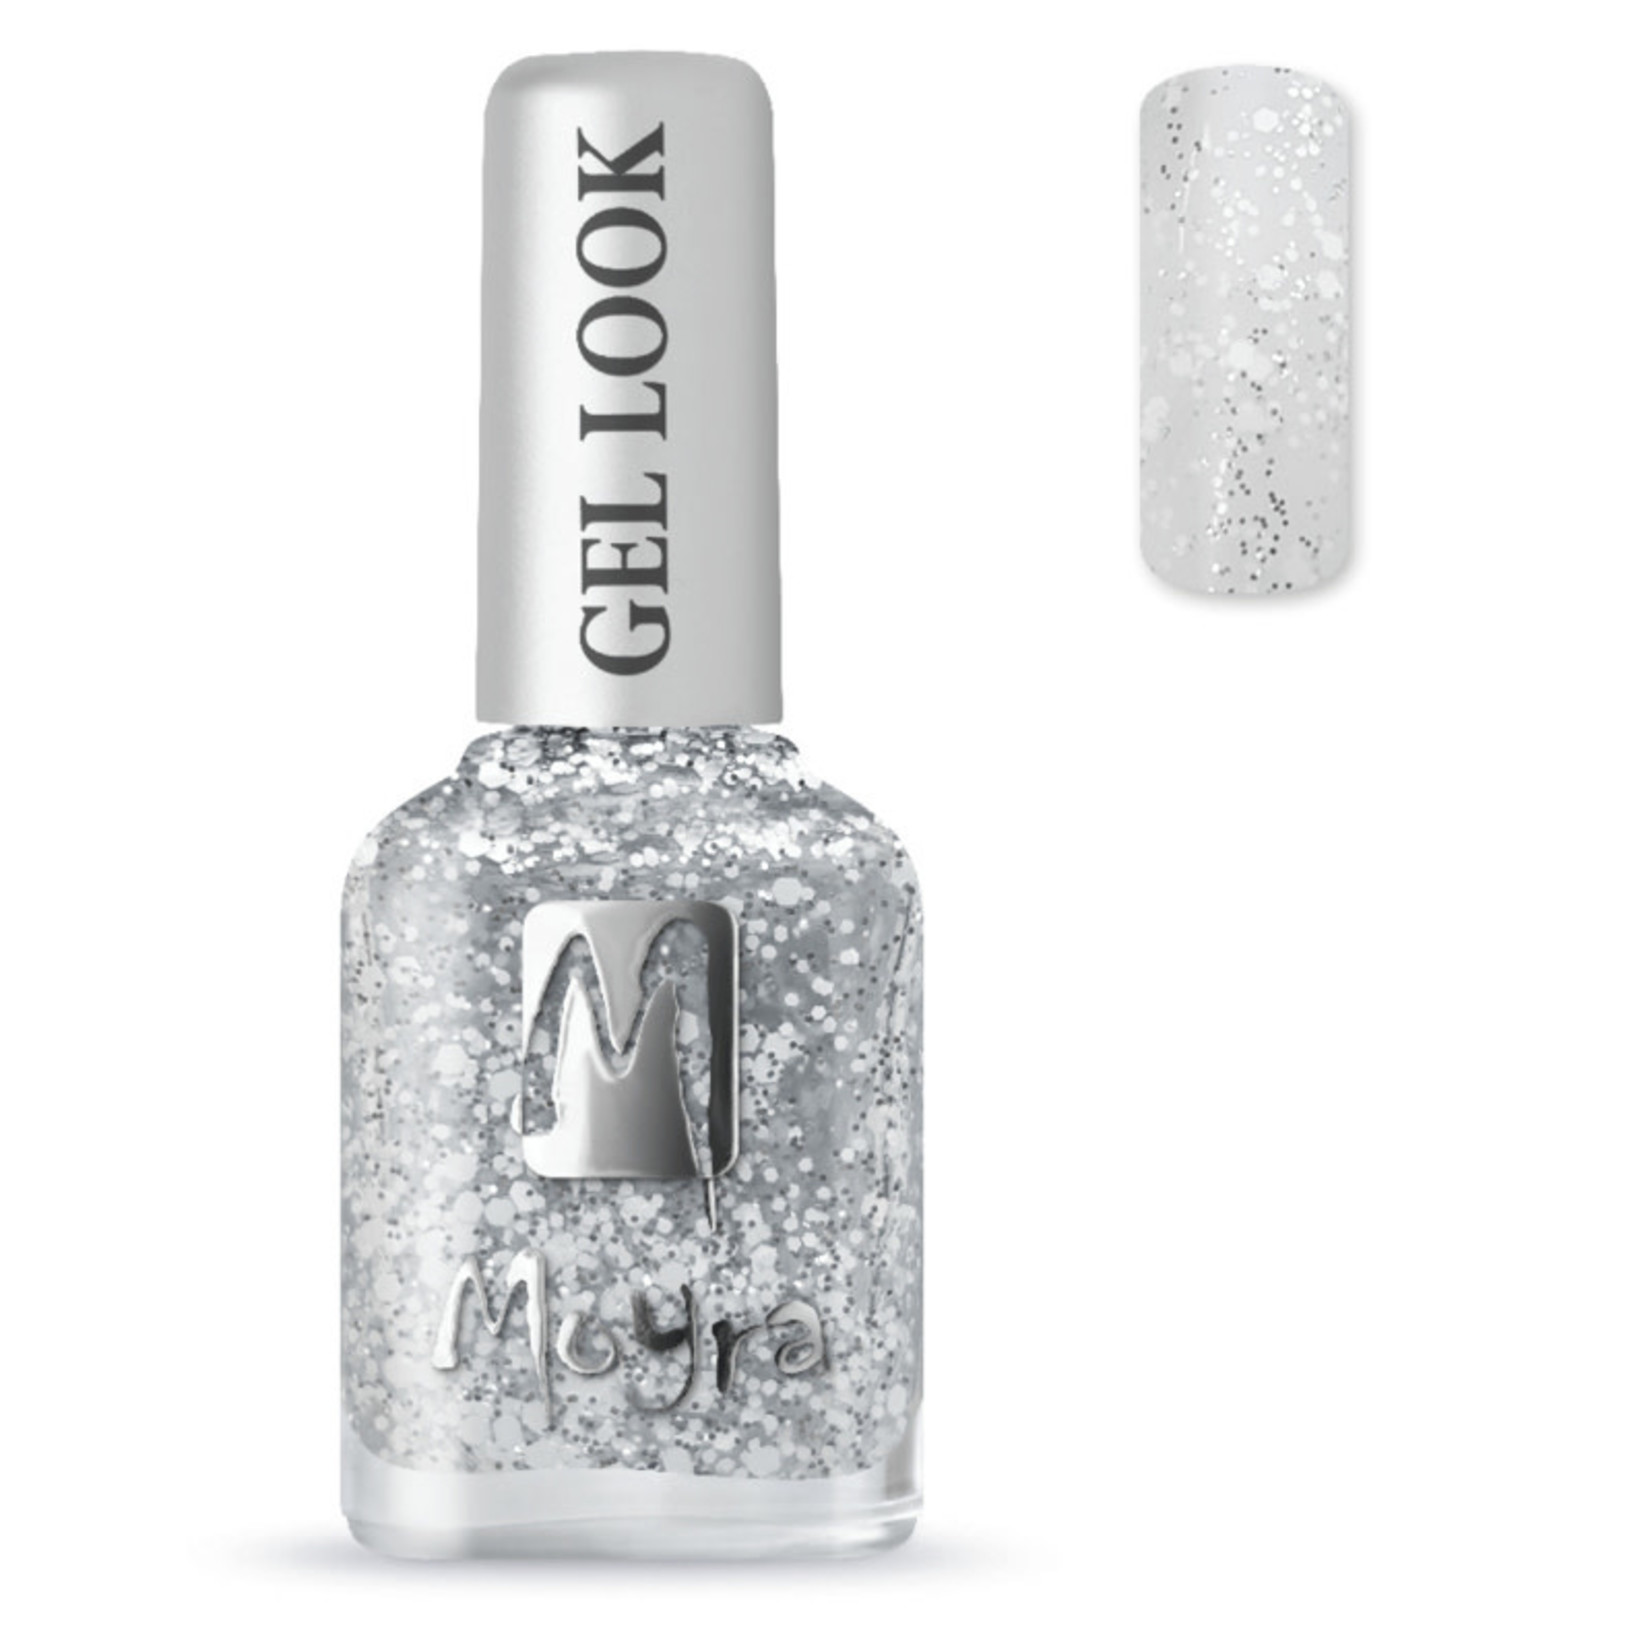 Moyra Moyra Gel Look nail polish 998 Élise